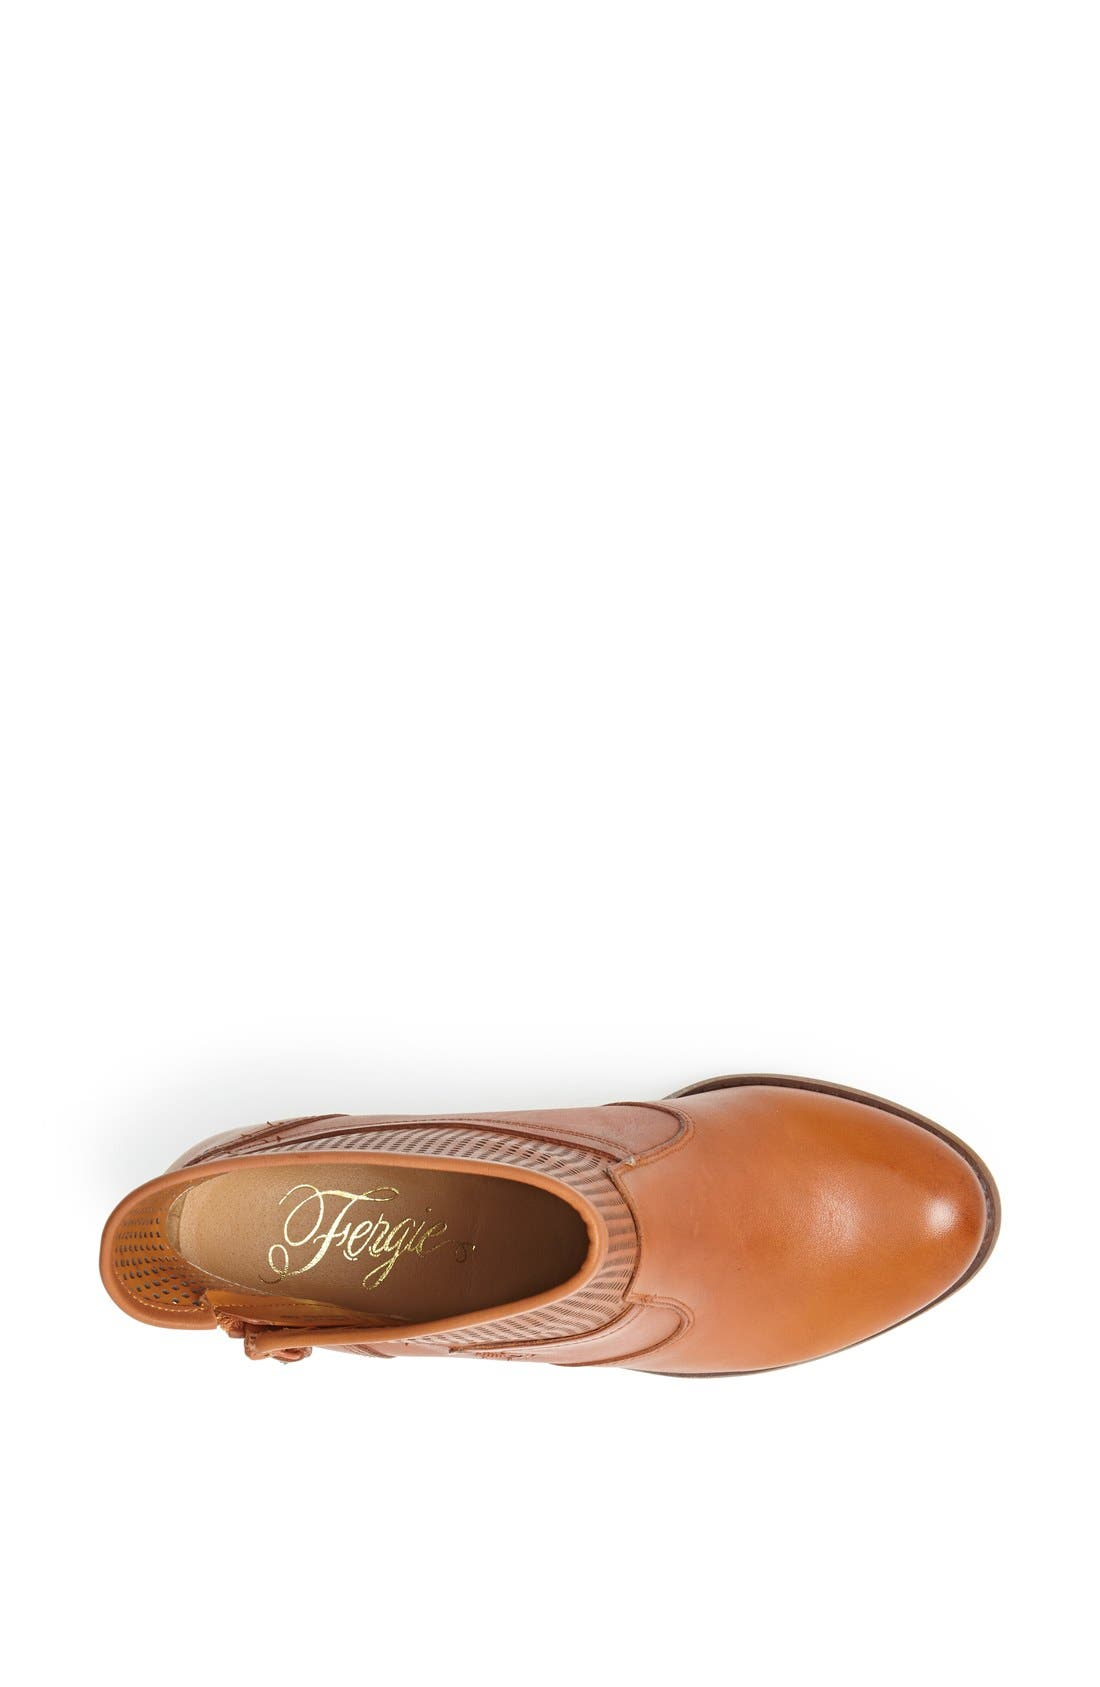 Alternate Image 3  - Fergie 'Mantra' Boot